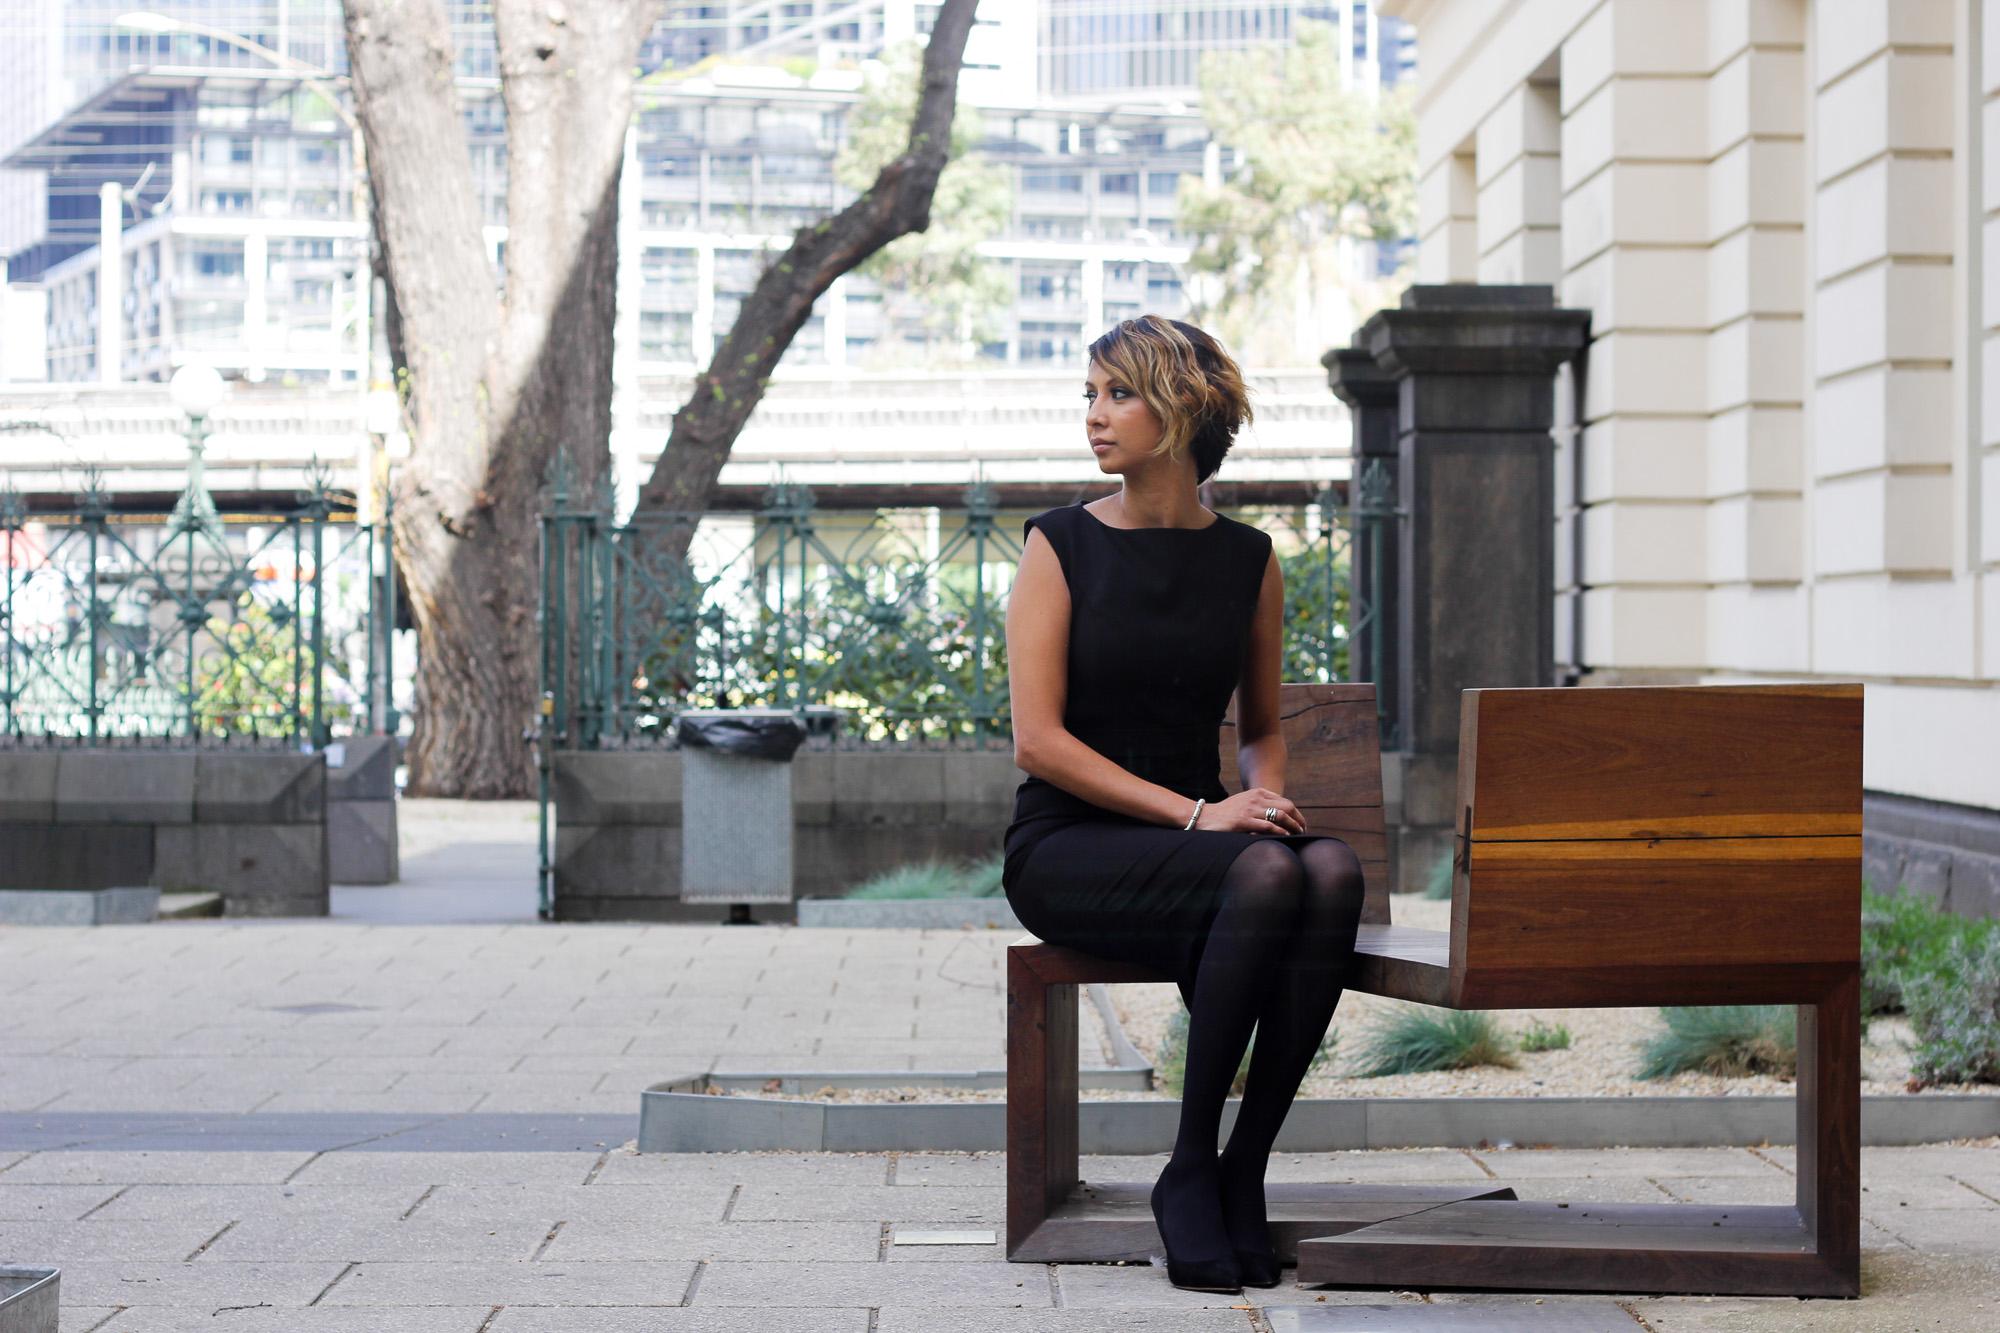 Bhav Fialkowski's Women in Tech Profile